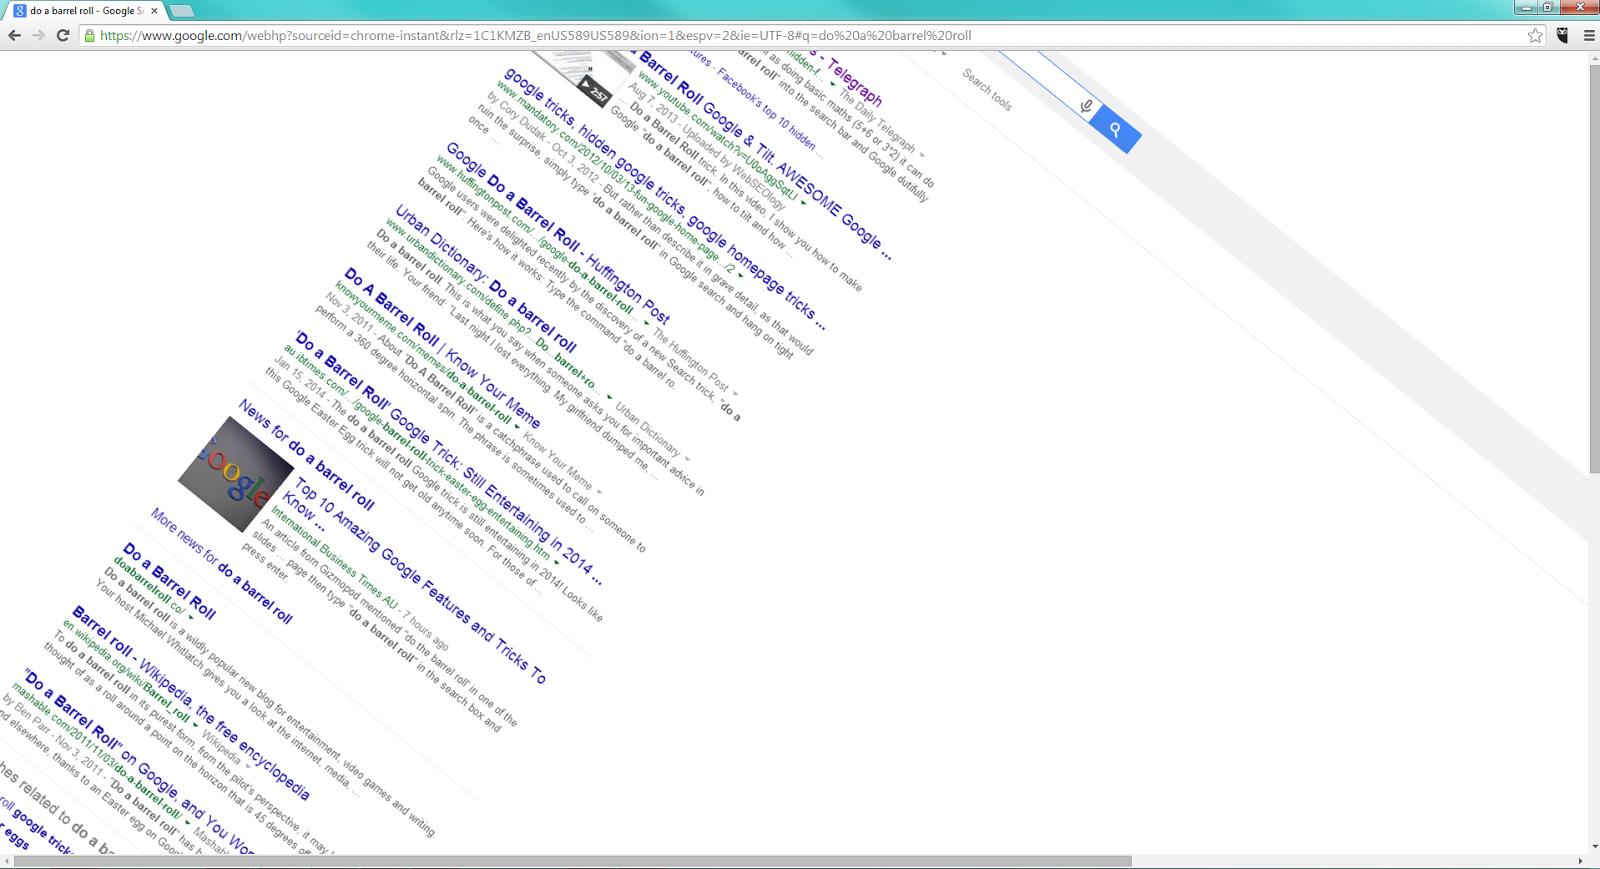 Screenshot of the screen barrel rolling